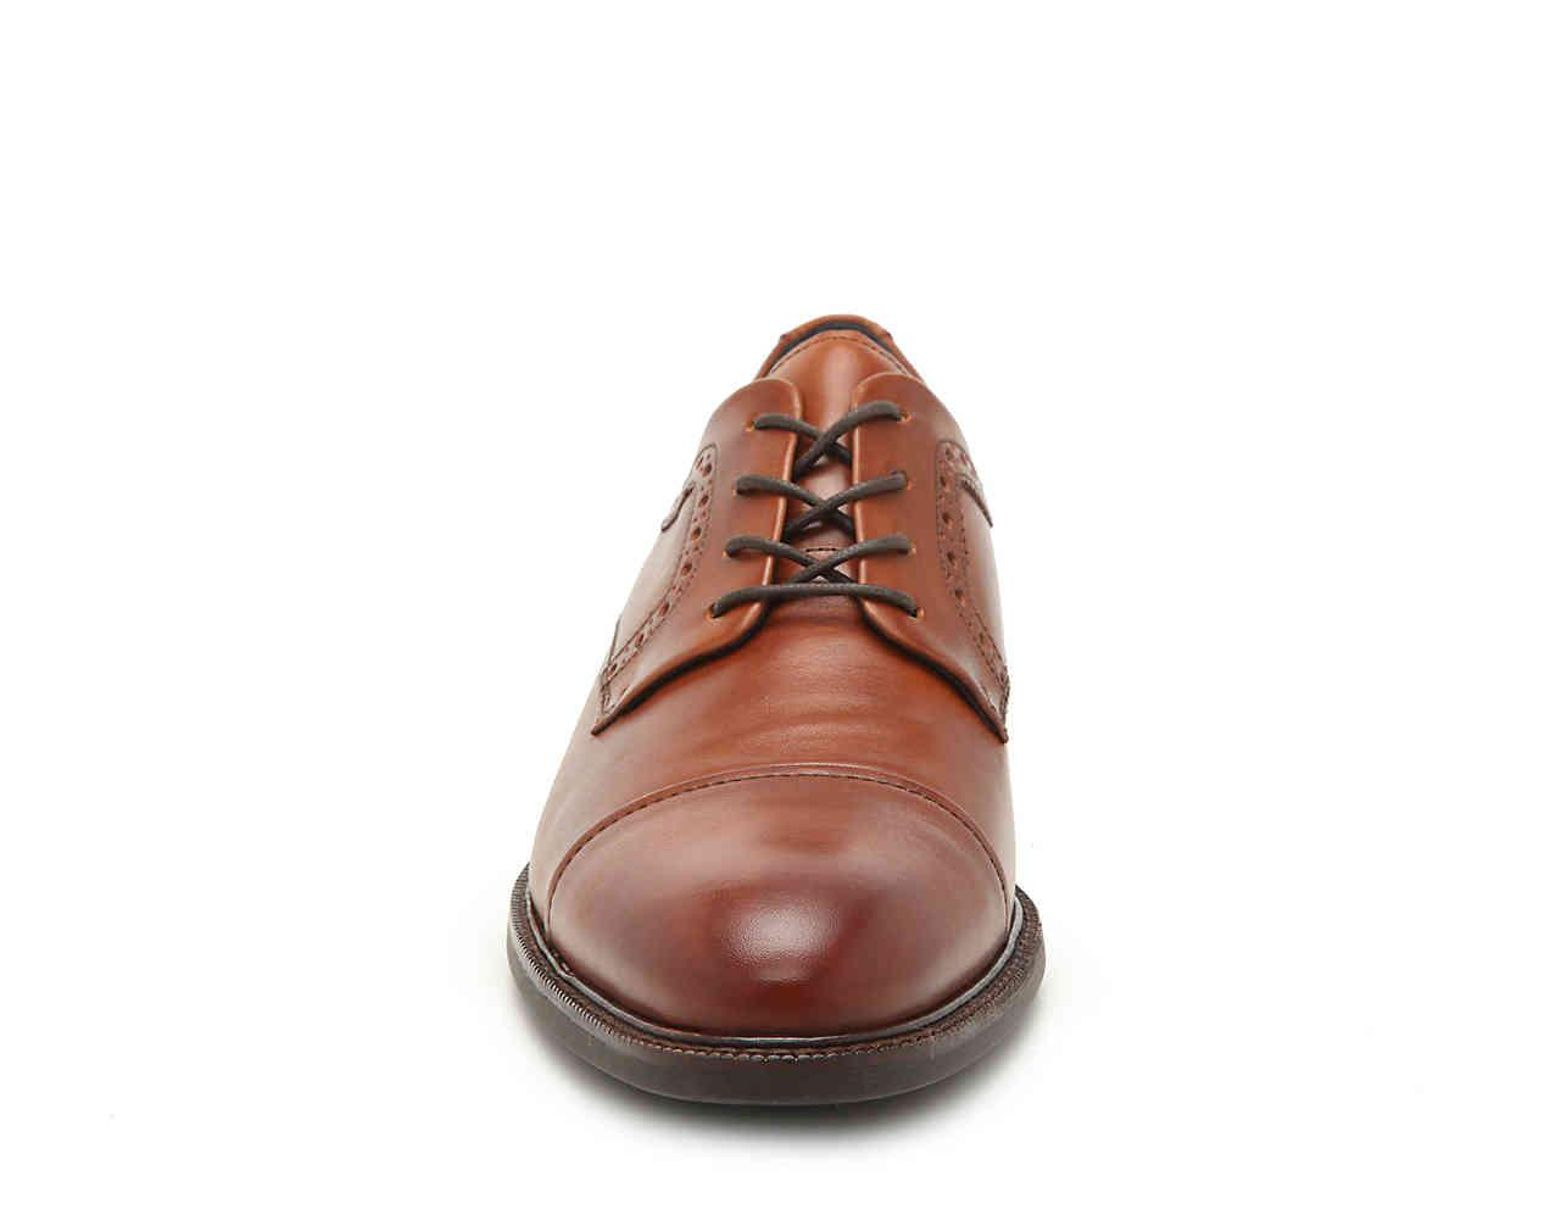 57c86815fe4 Cole Haan Buckland Cap Toe Oxford in Brown for Men - Lyst